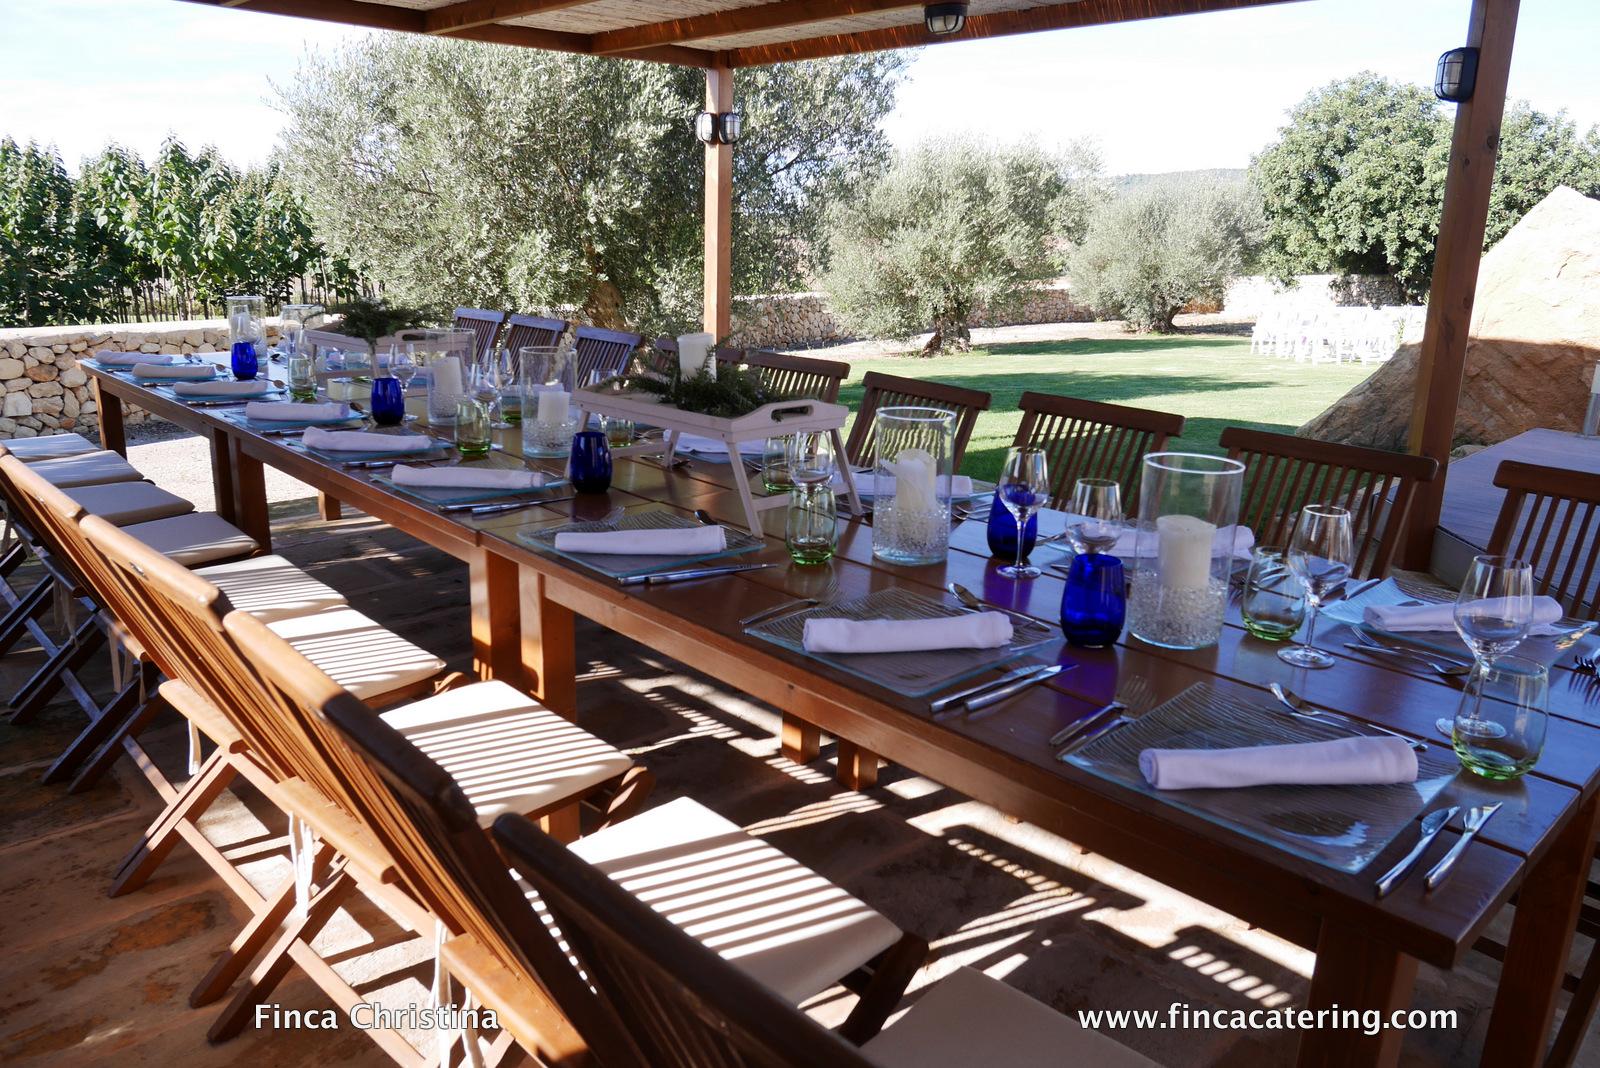 07 Finca Catering 10 17 2014 42 - Property Cristina